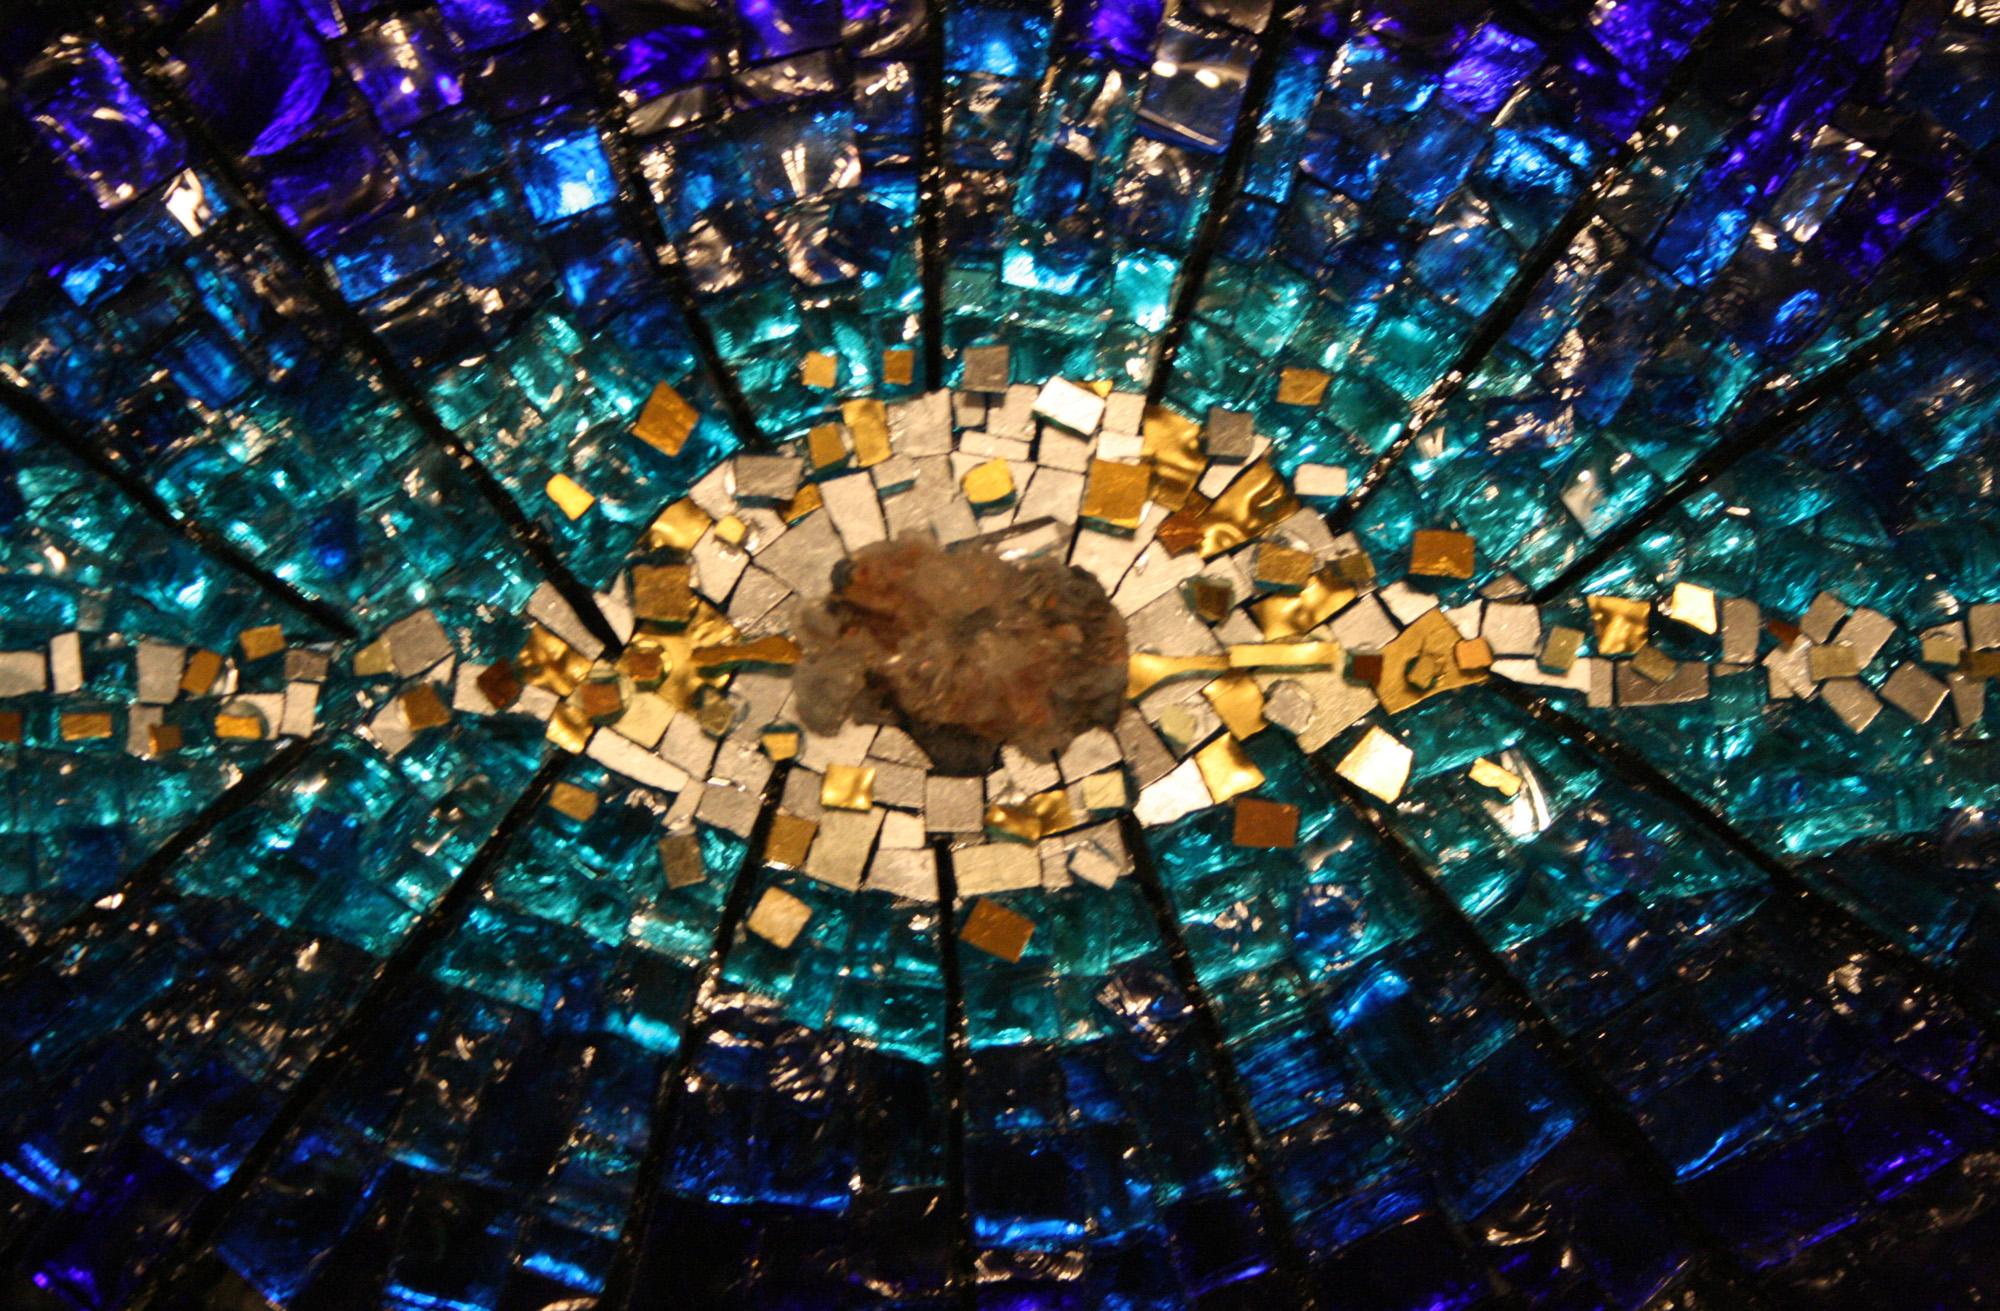 Cosmic Detail